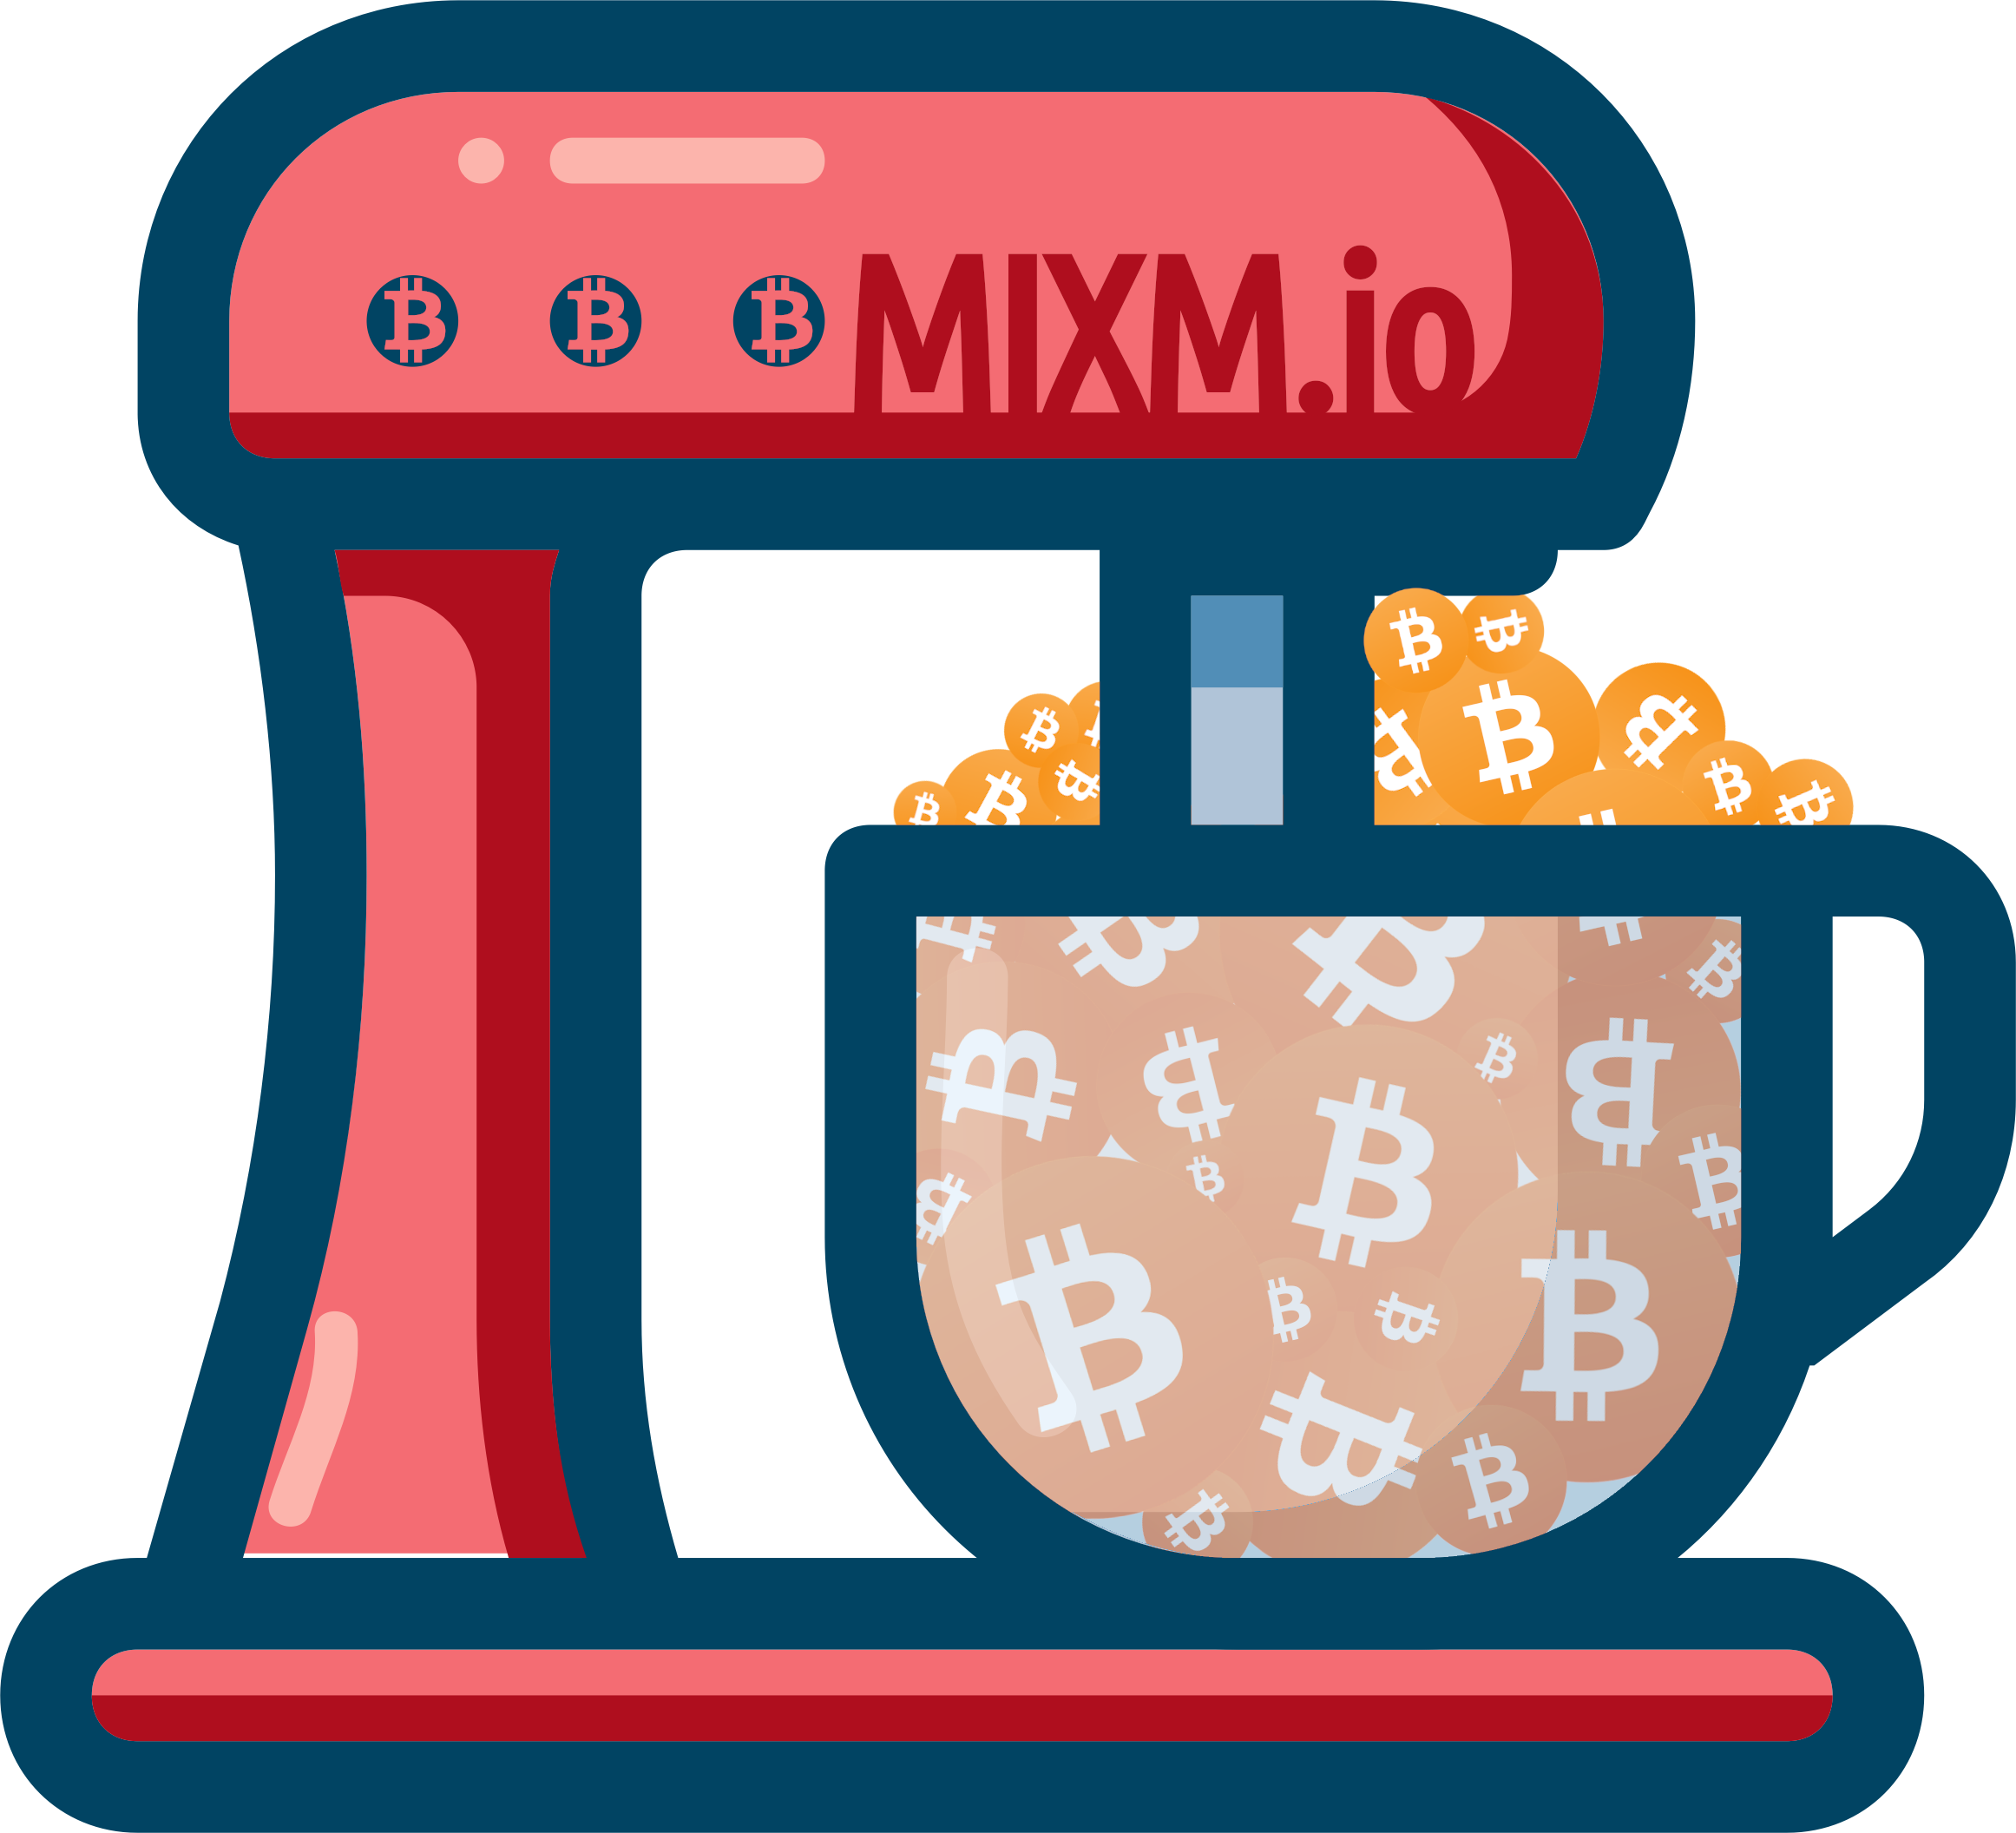 MIXM.io logo